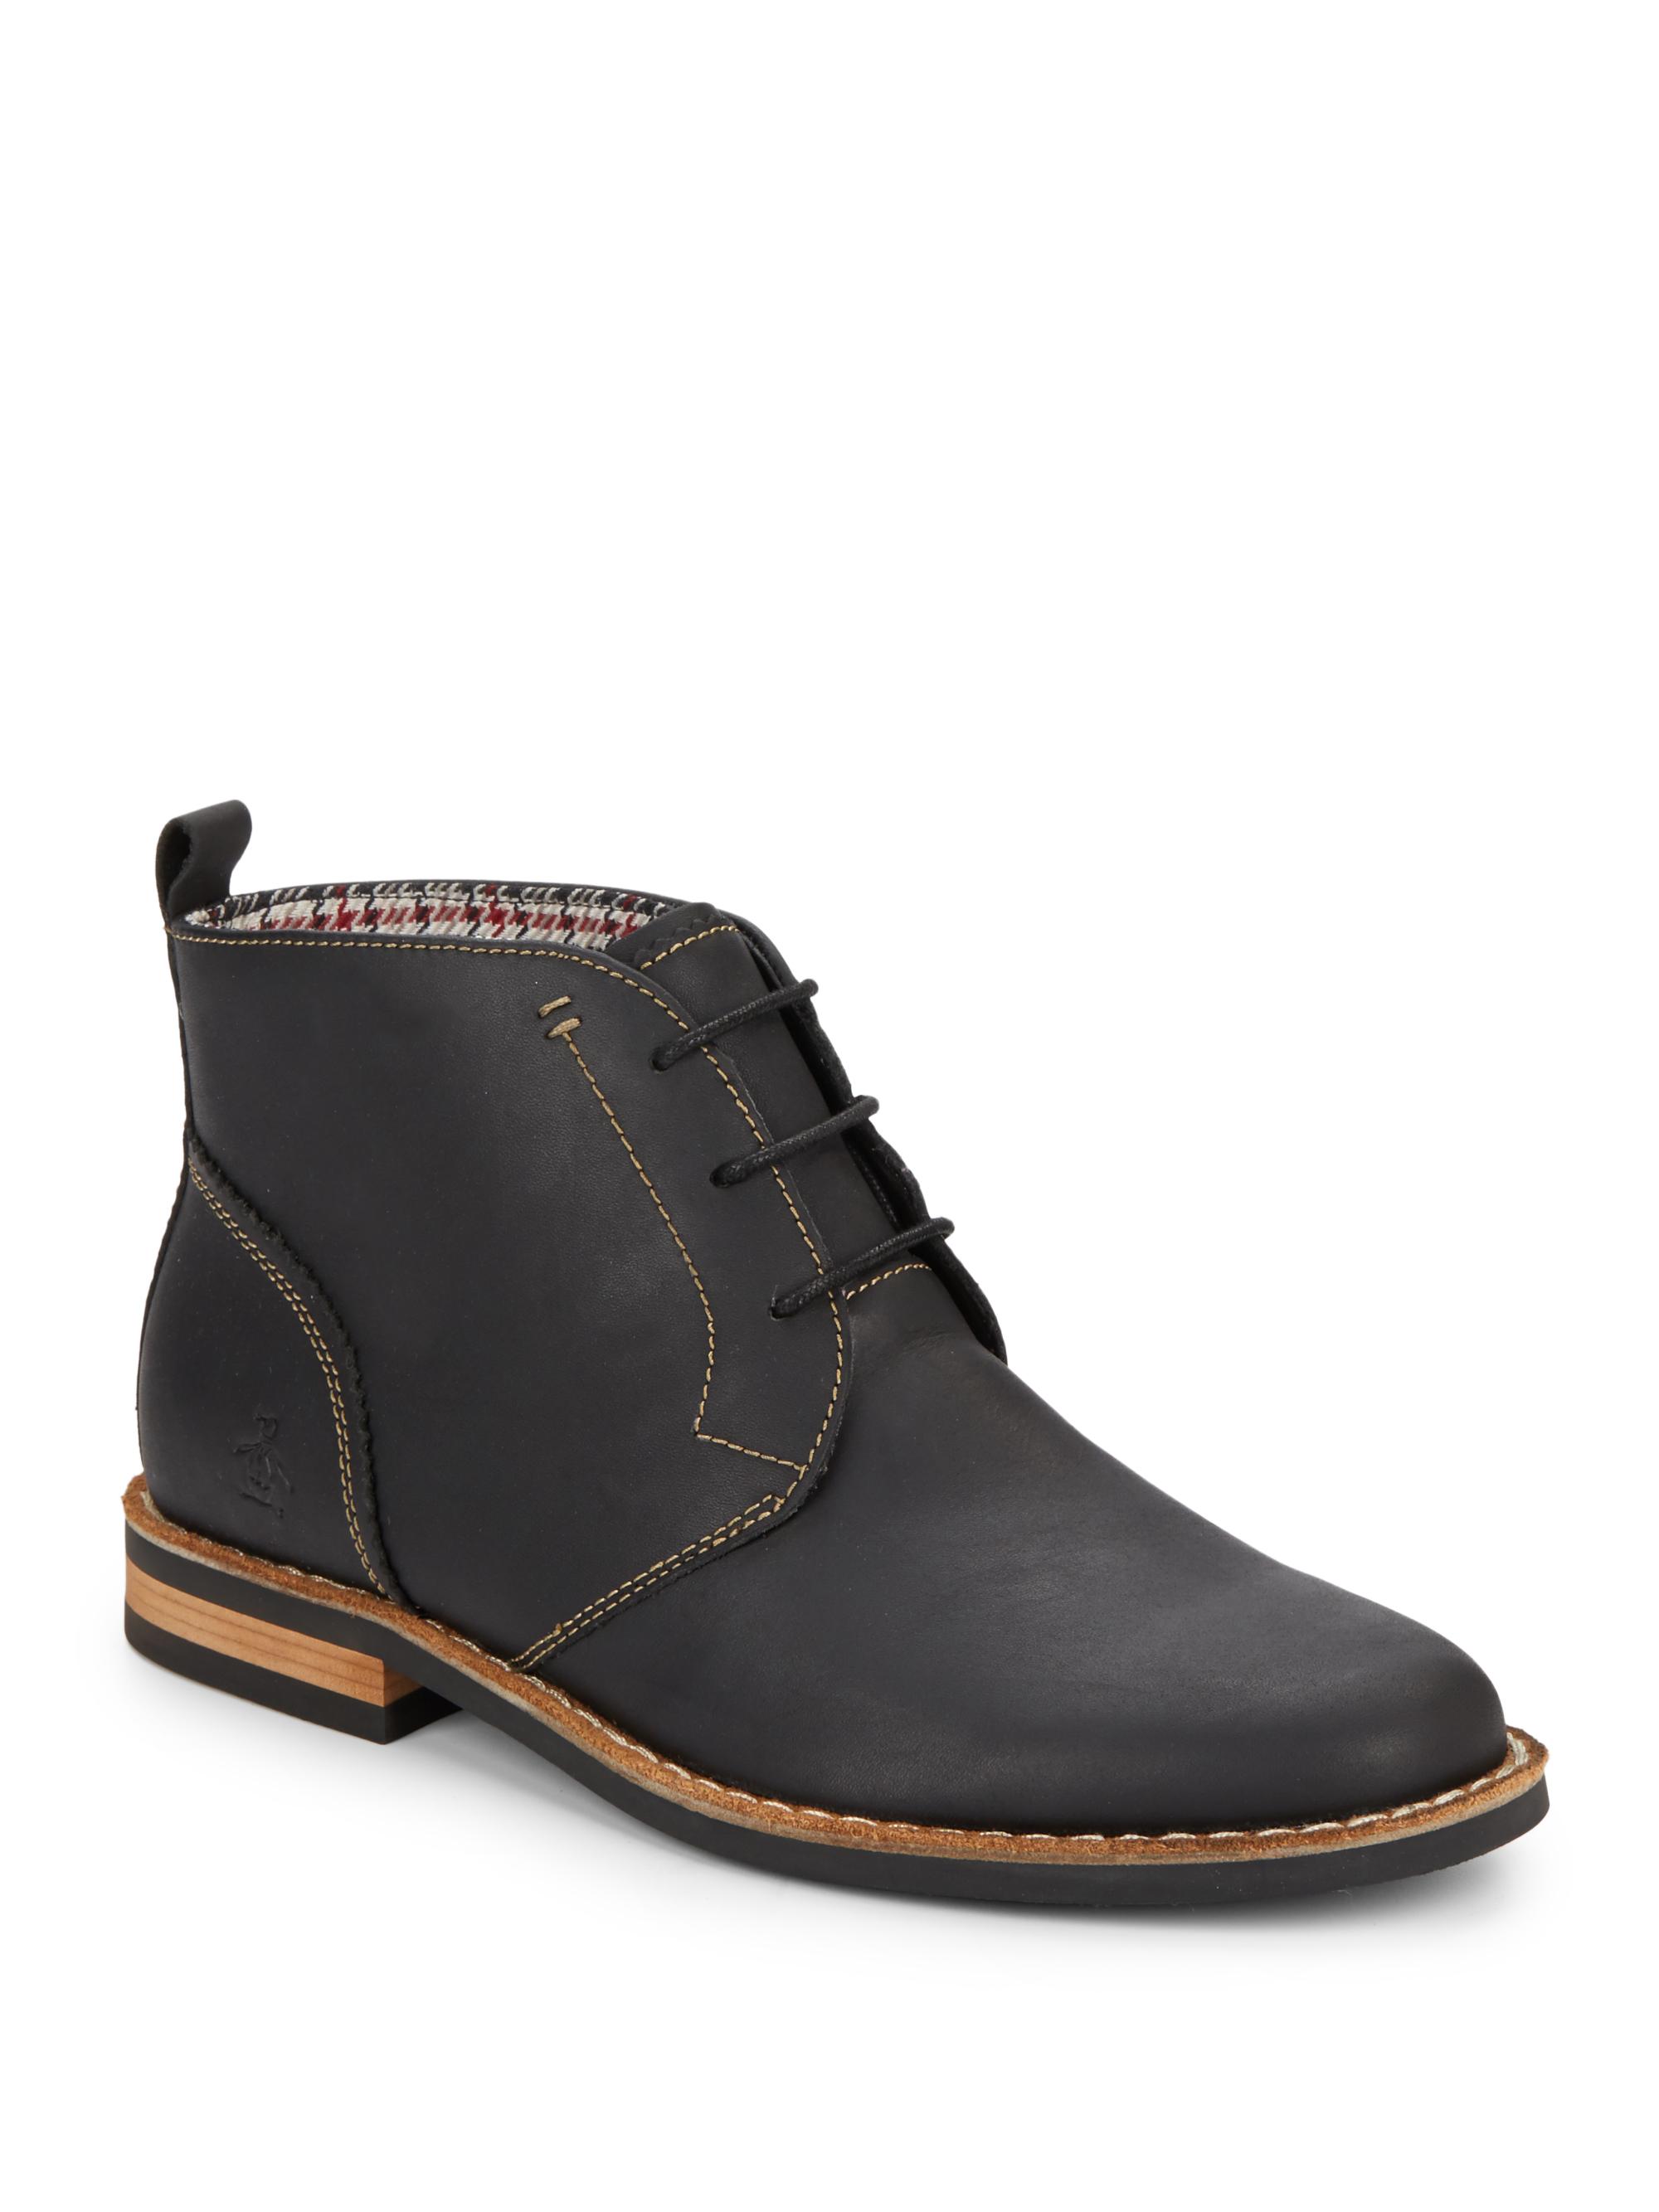 Shoes-029.JPG